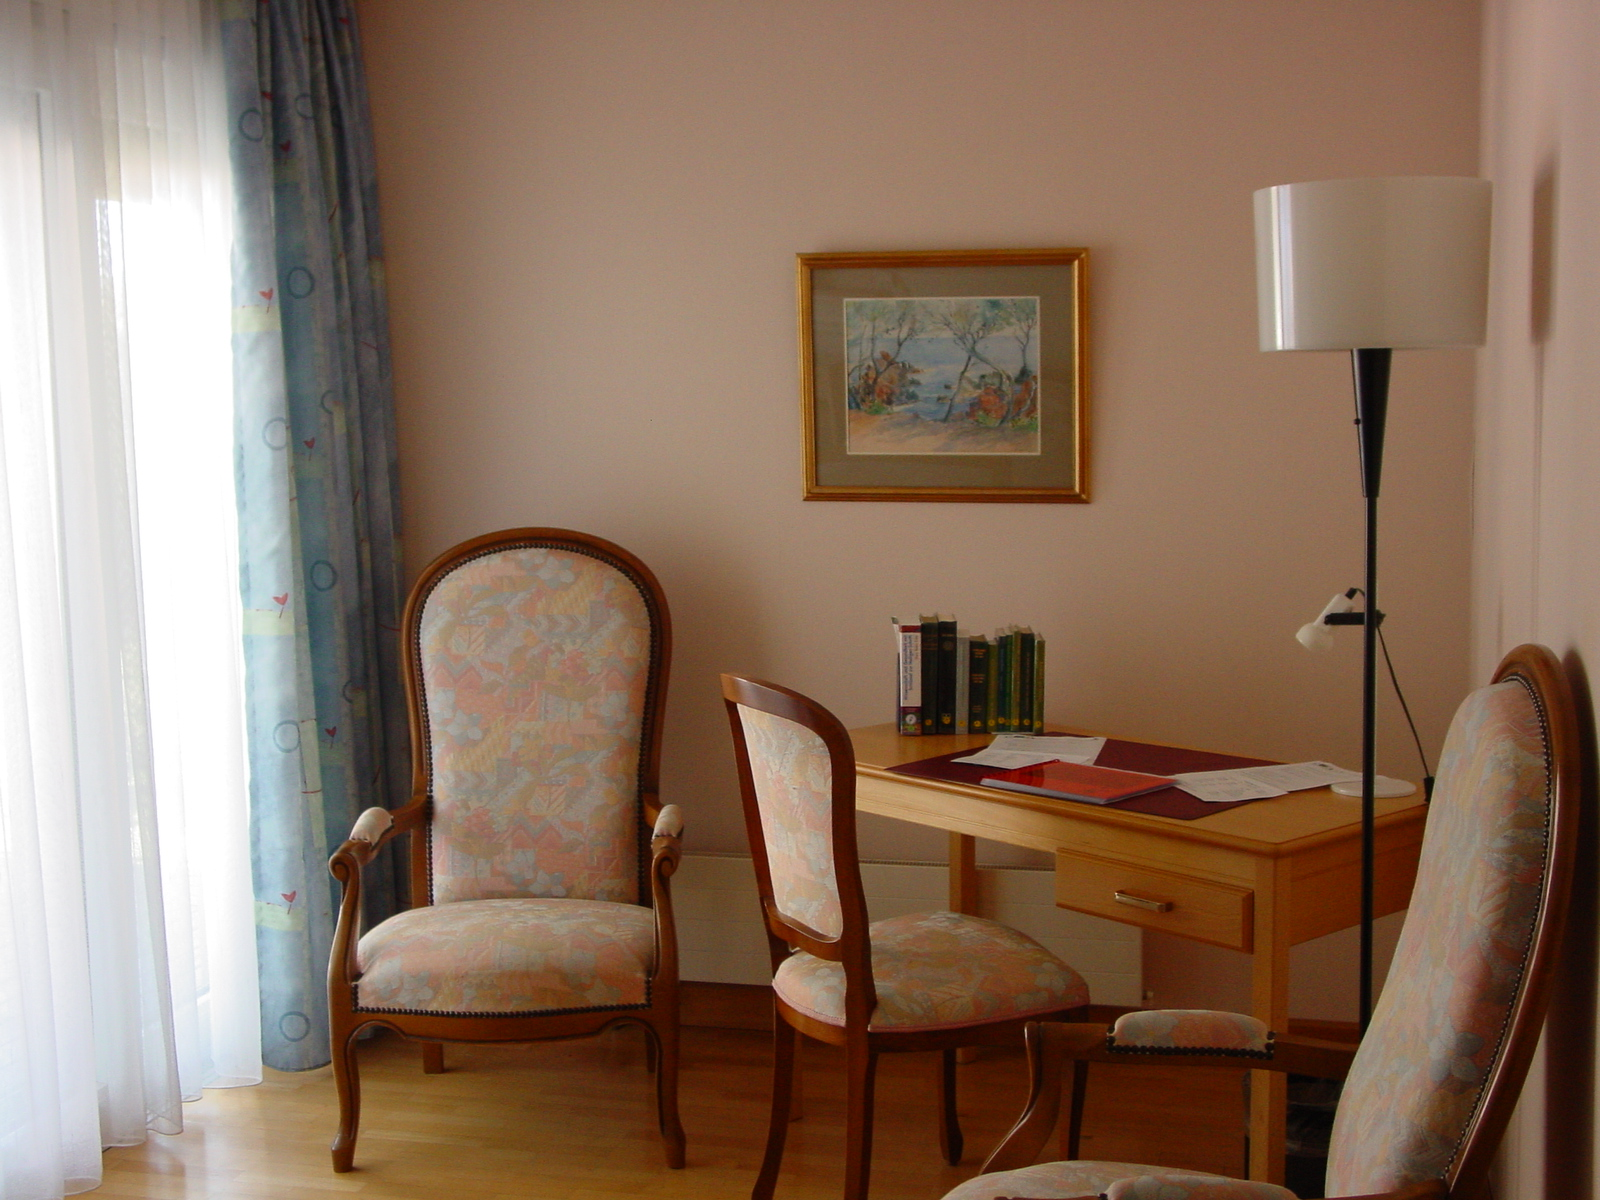 Le-Verger-Roomdesk.jpg